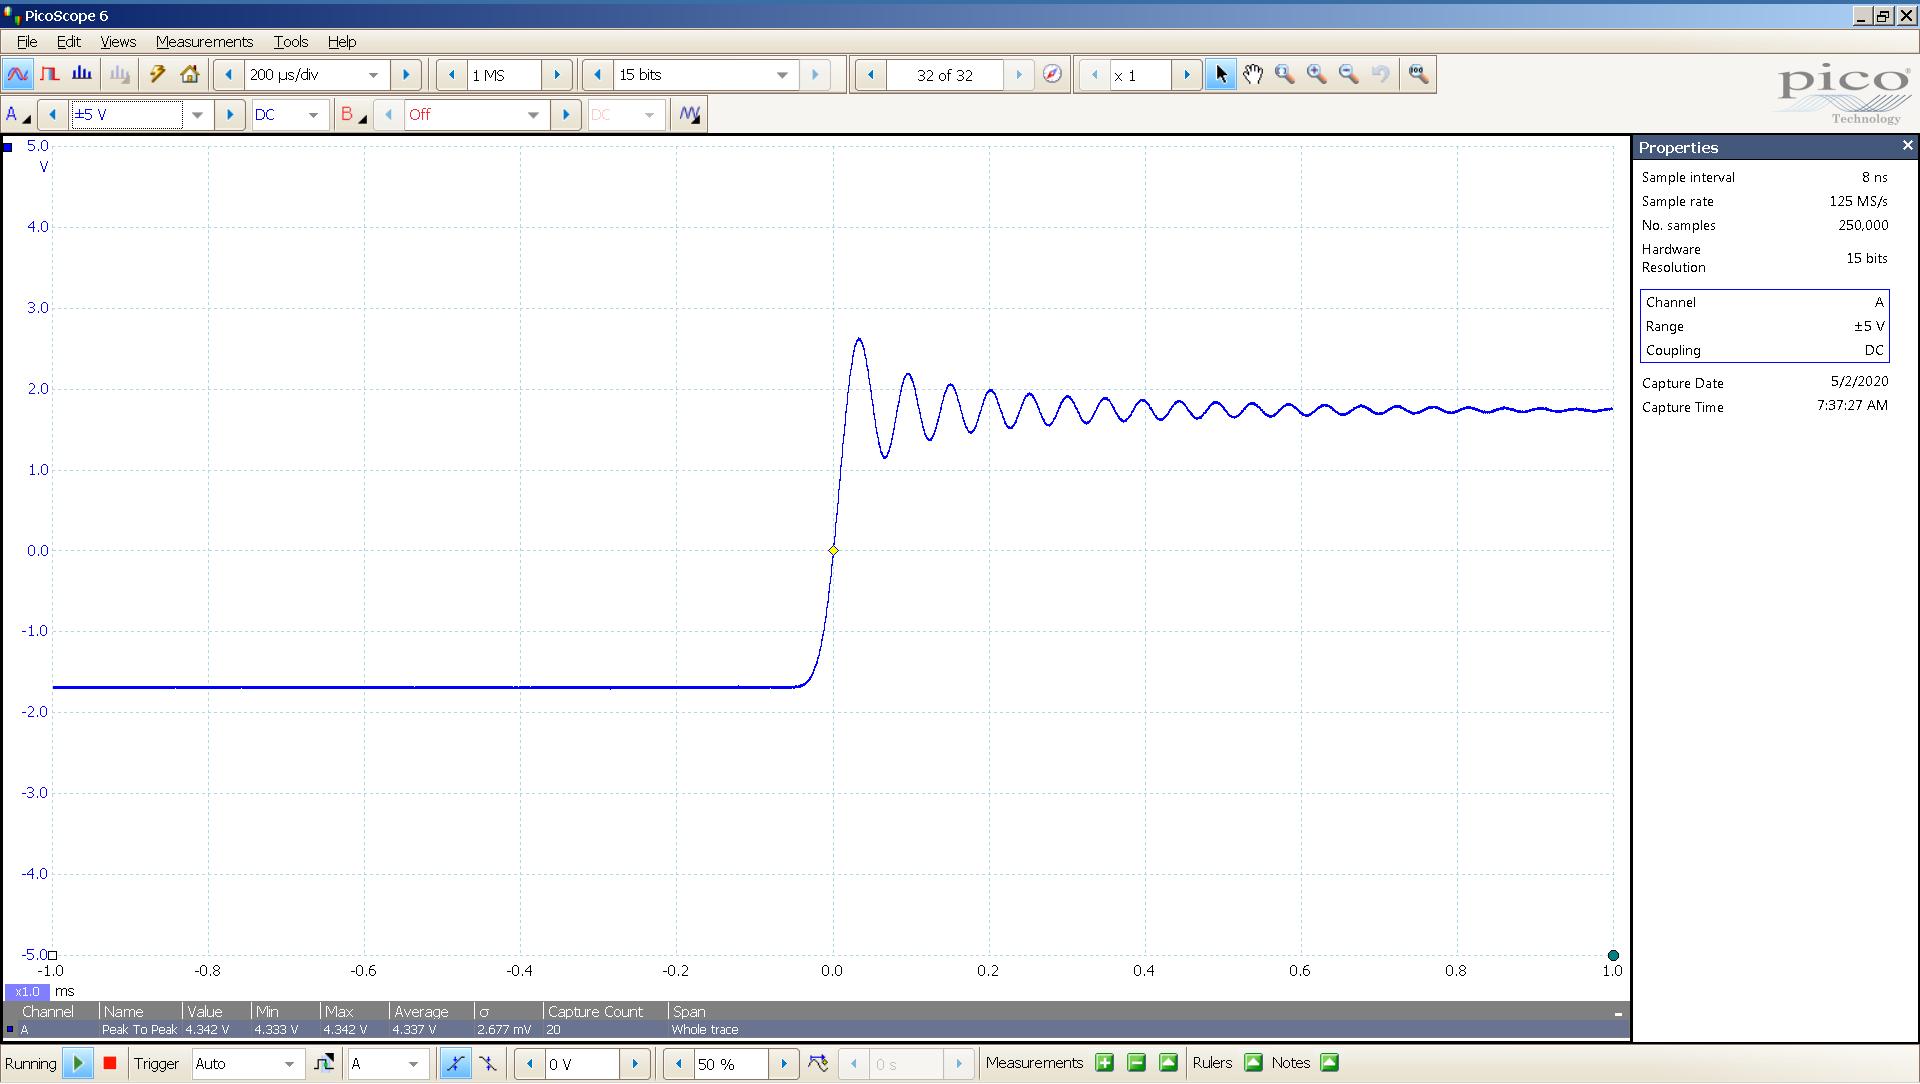 20200502-06 KTE Spring2 20 Hz sqr -4 dBFS 4 Vpp 200uS div SE - ASIO - OS.png